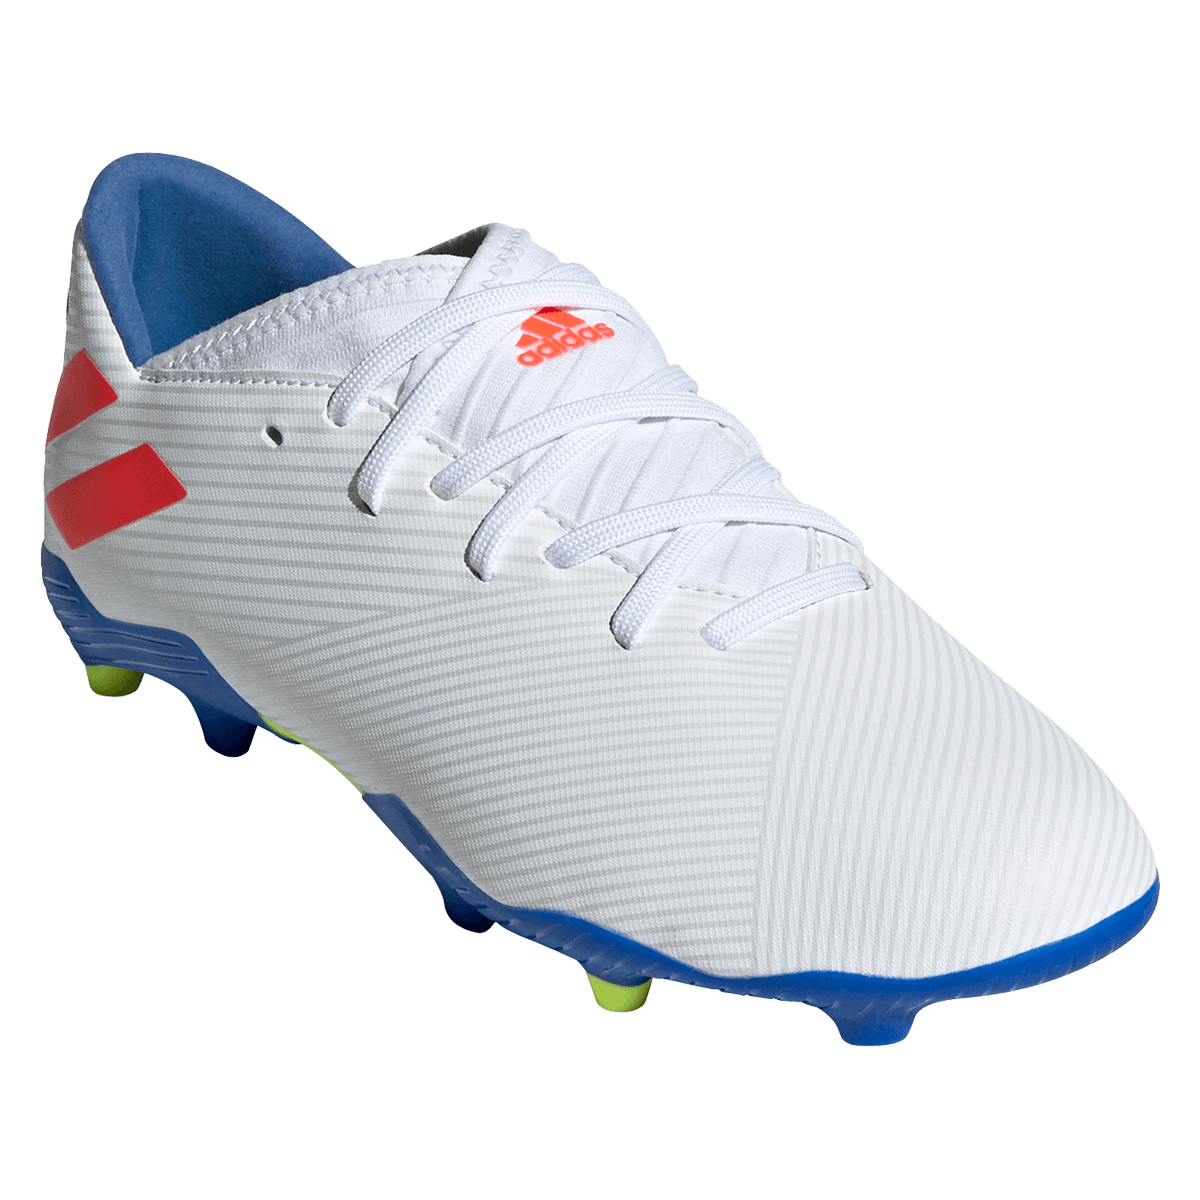 adidas Kinder Fußballschuh Nemeziz Messi 19.3 FG J weißrot